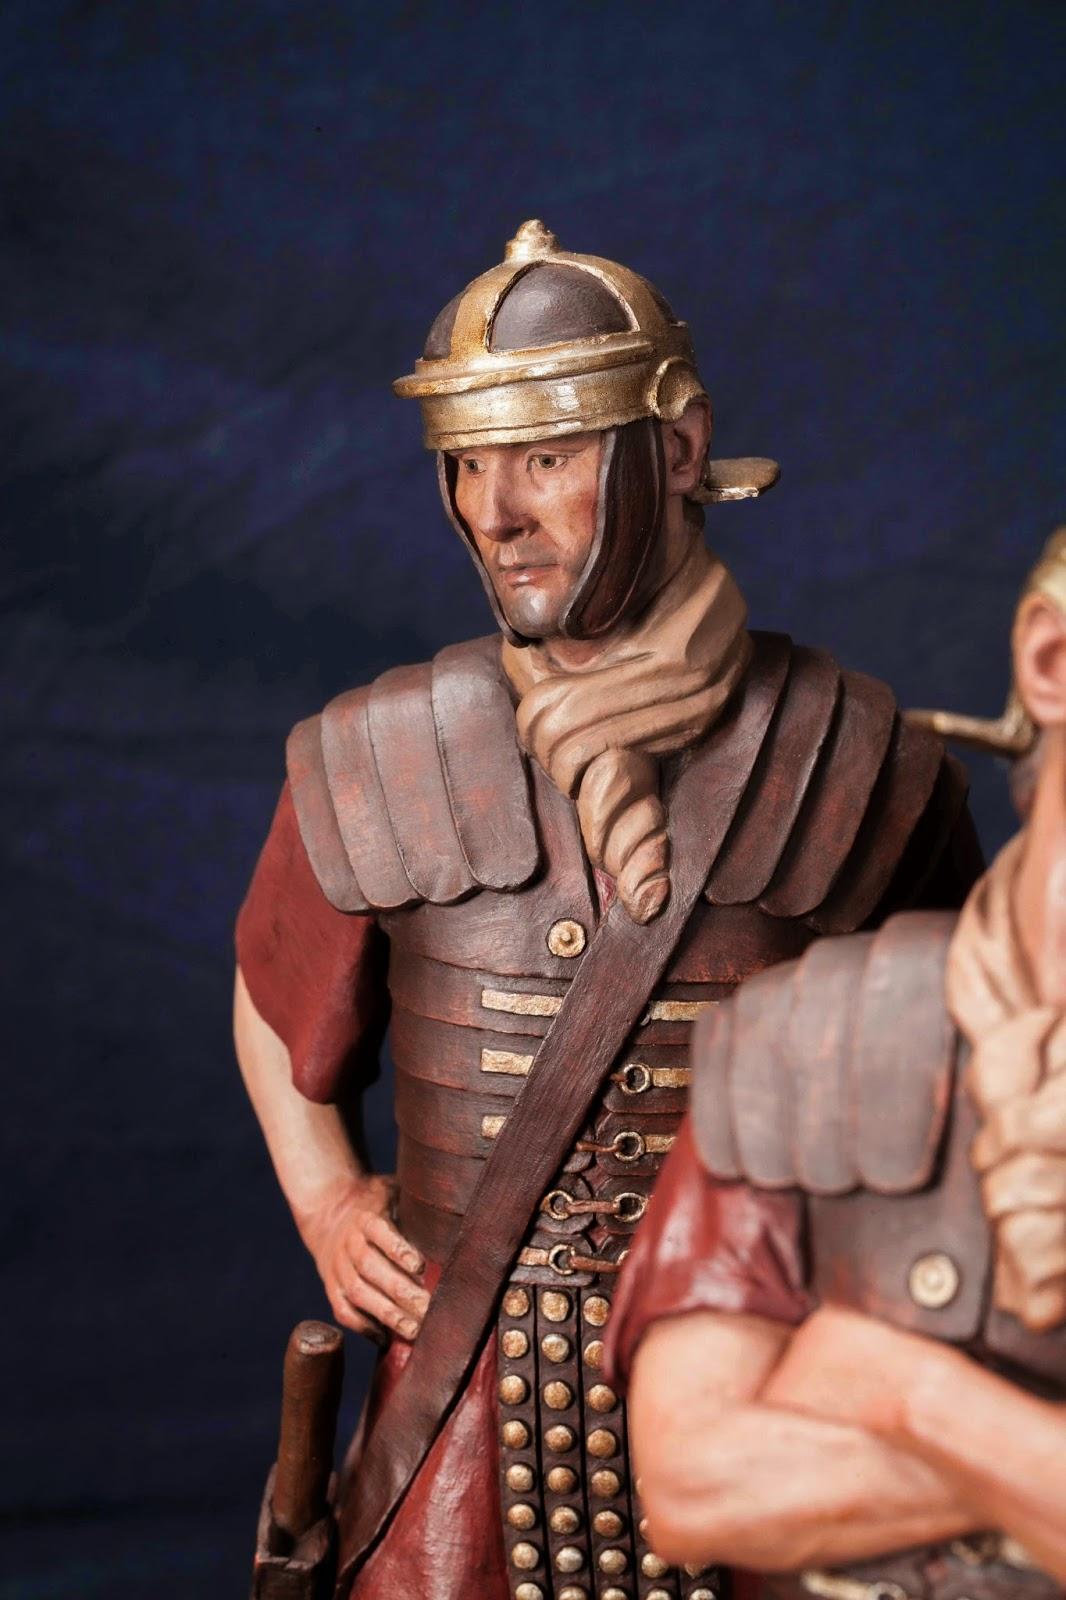 Belén presepe nativity krippe Arturo Serra escultura barro cocido 9